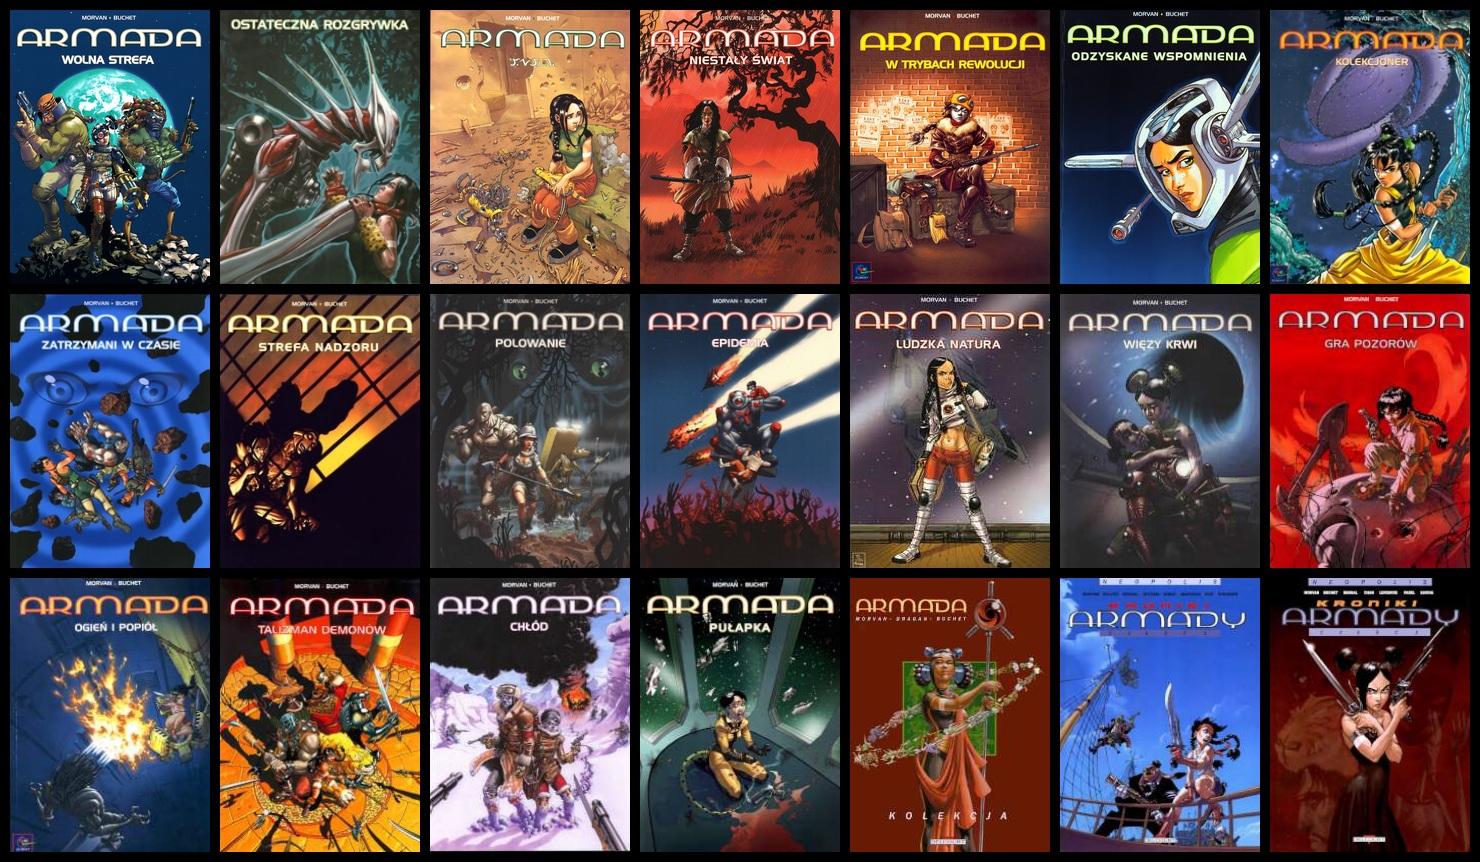 Armada - Różne Komiksy